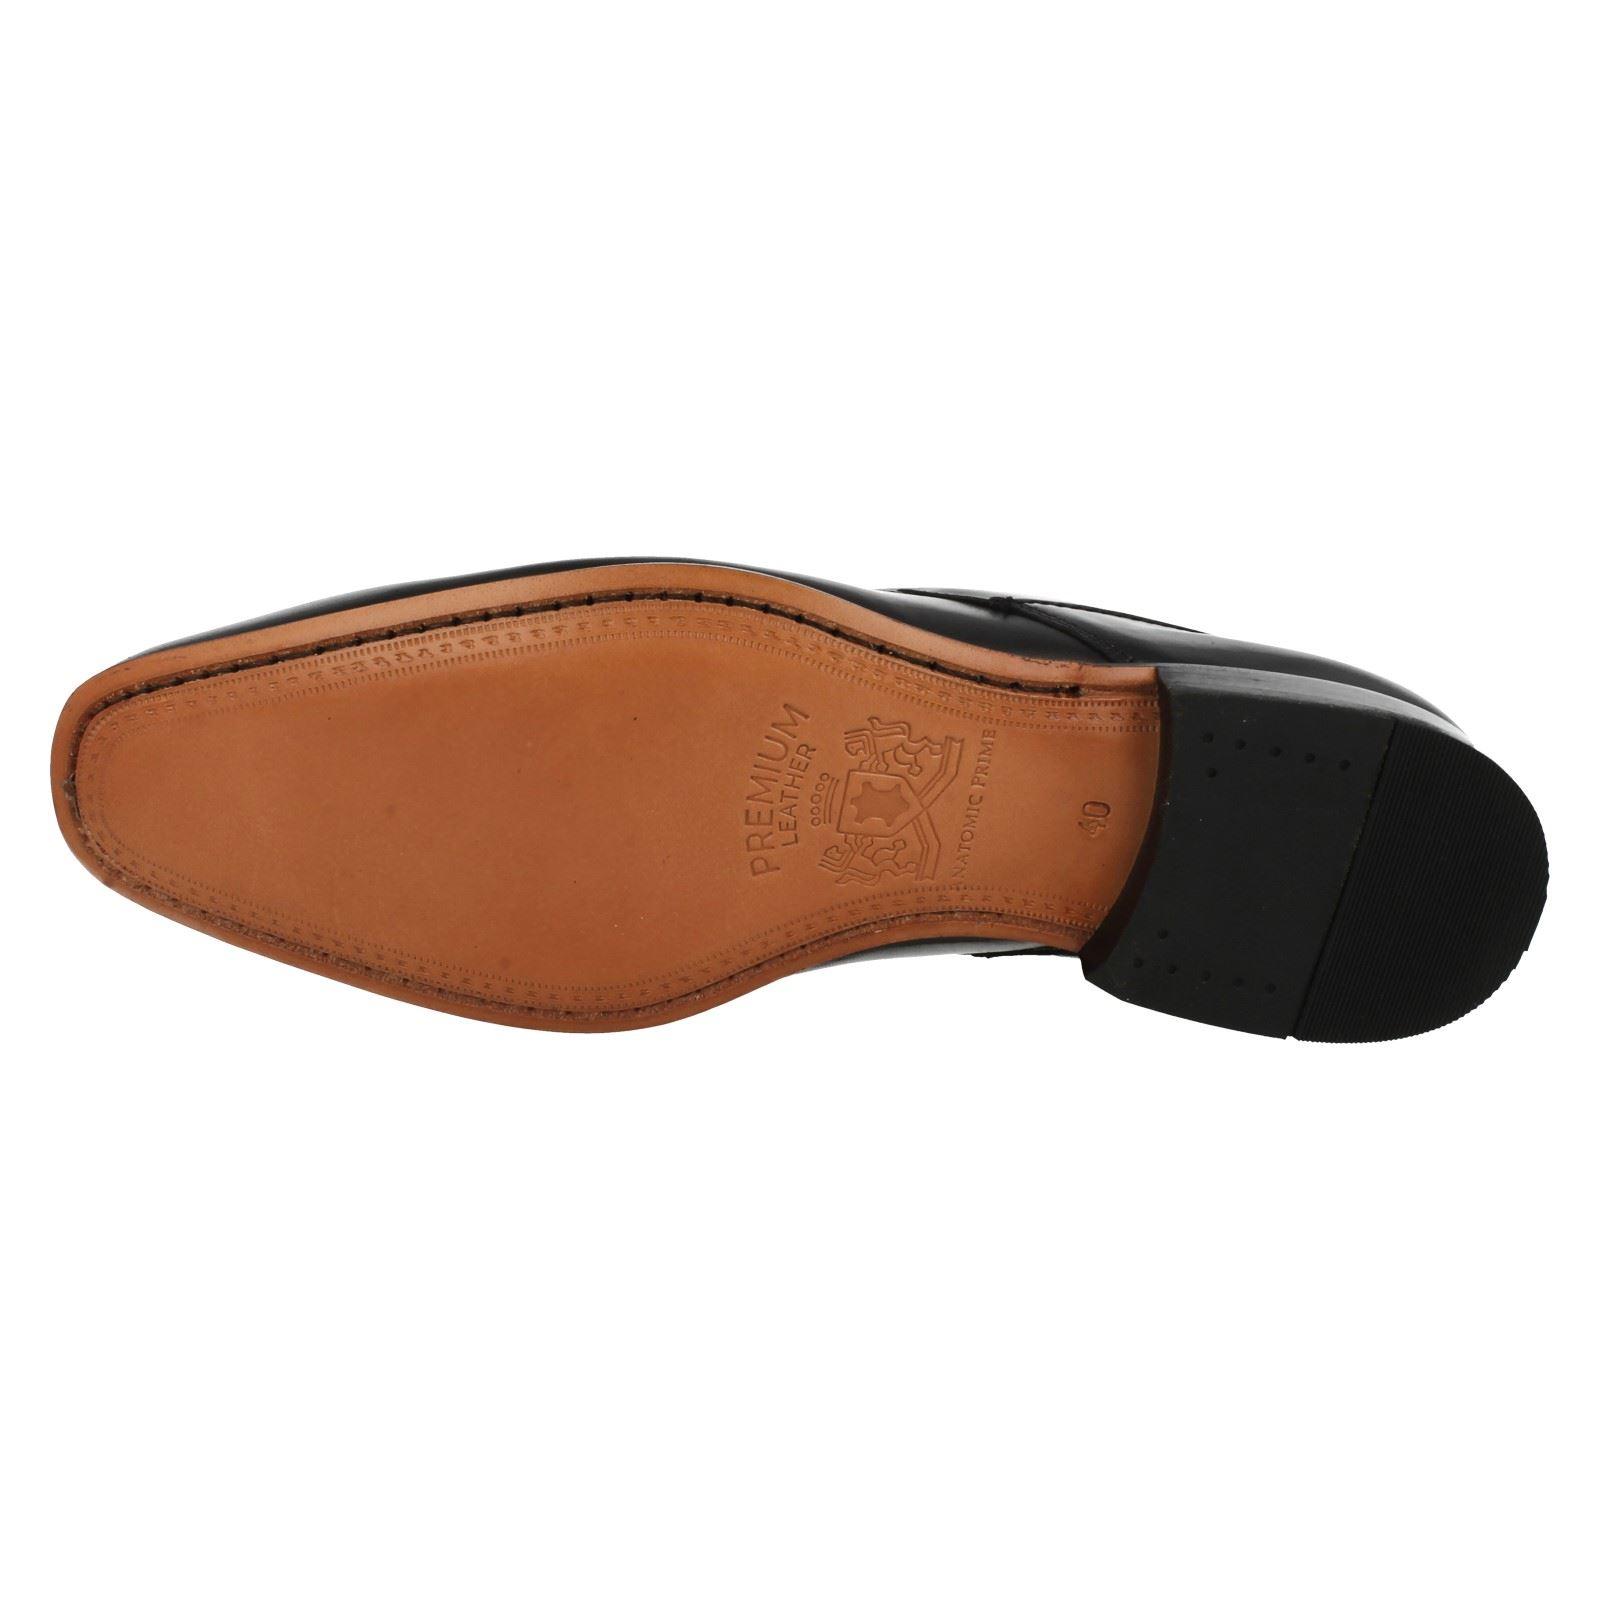 Mens Anatomic Prime Smart Formal Lace Up Shoes Salvador 2